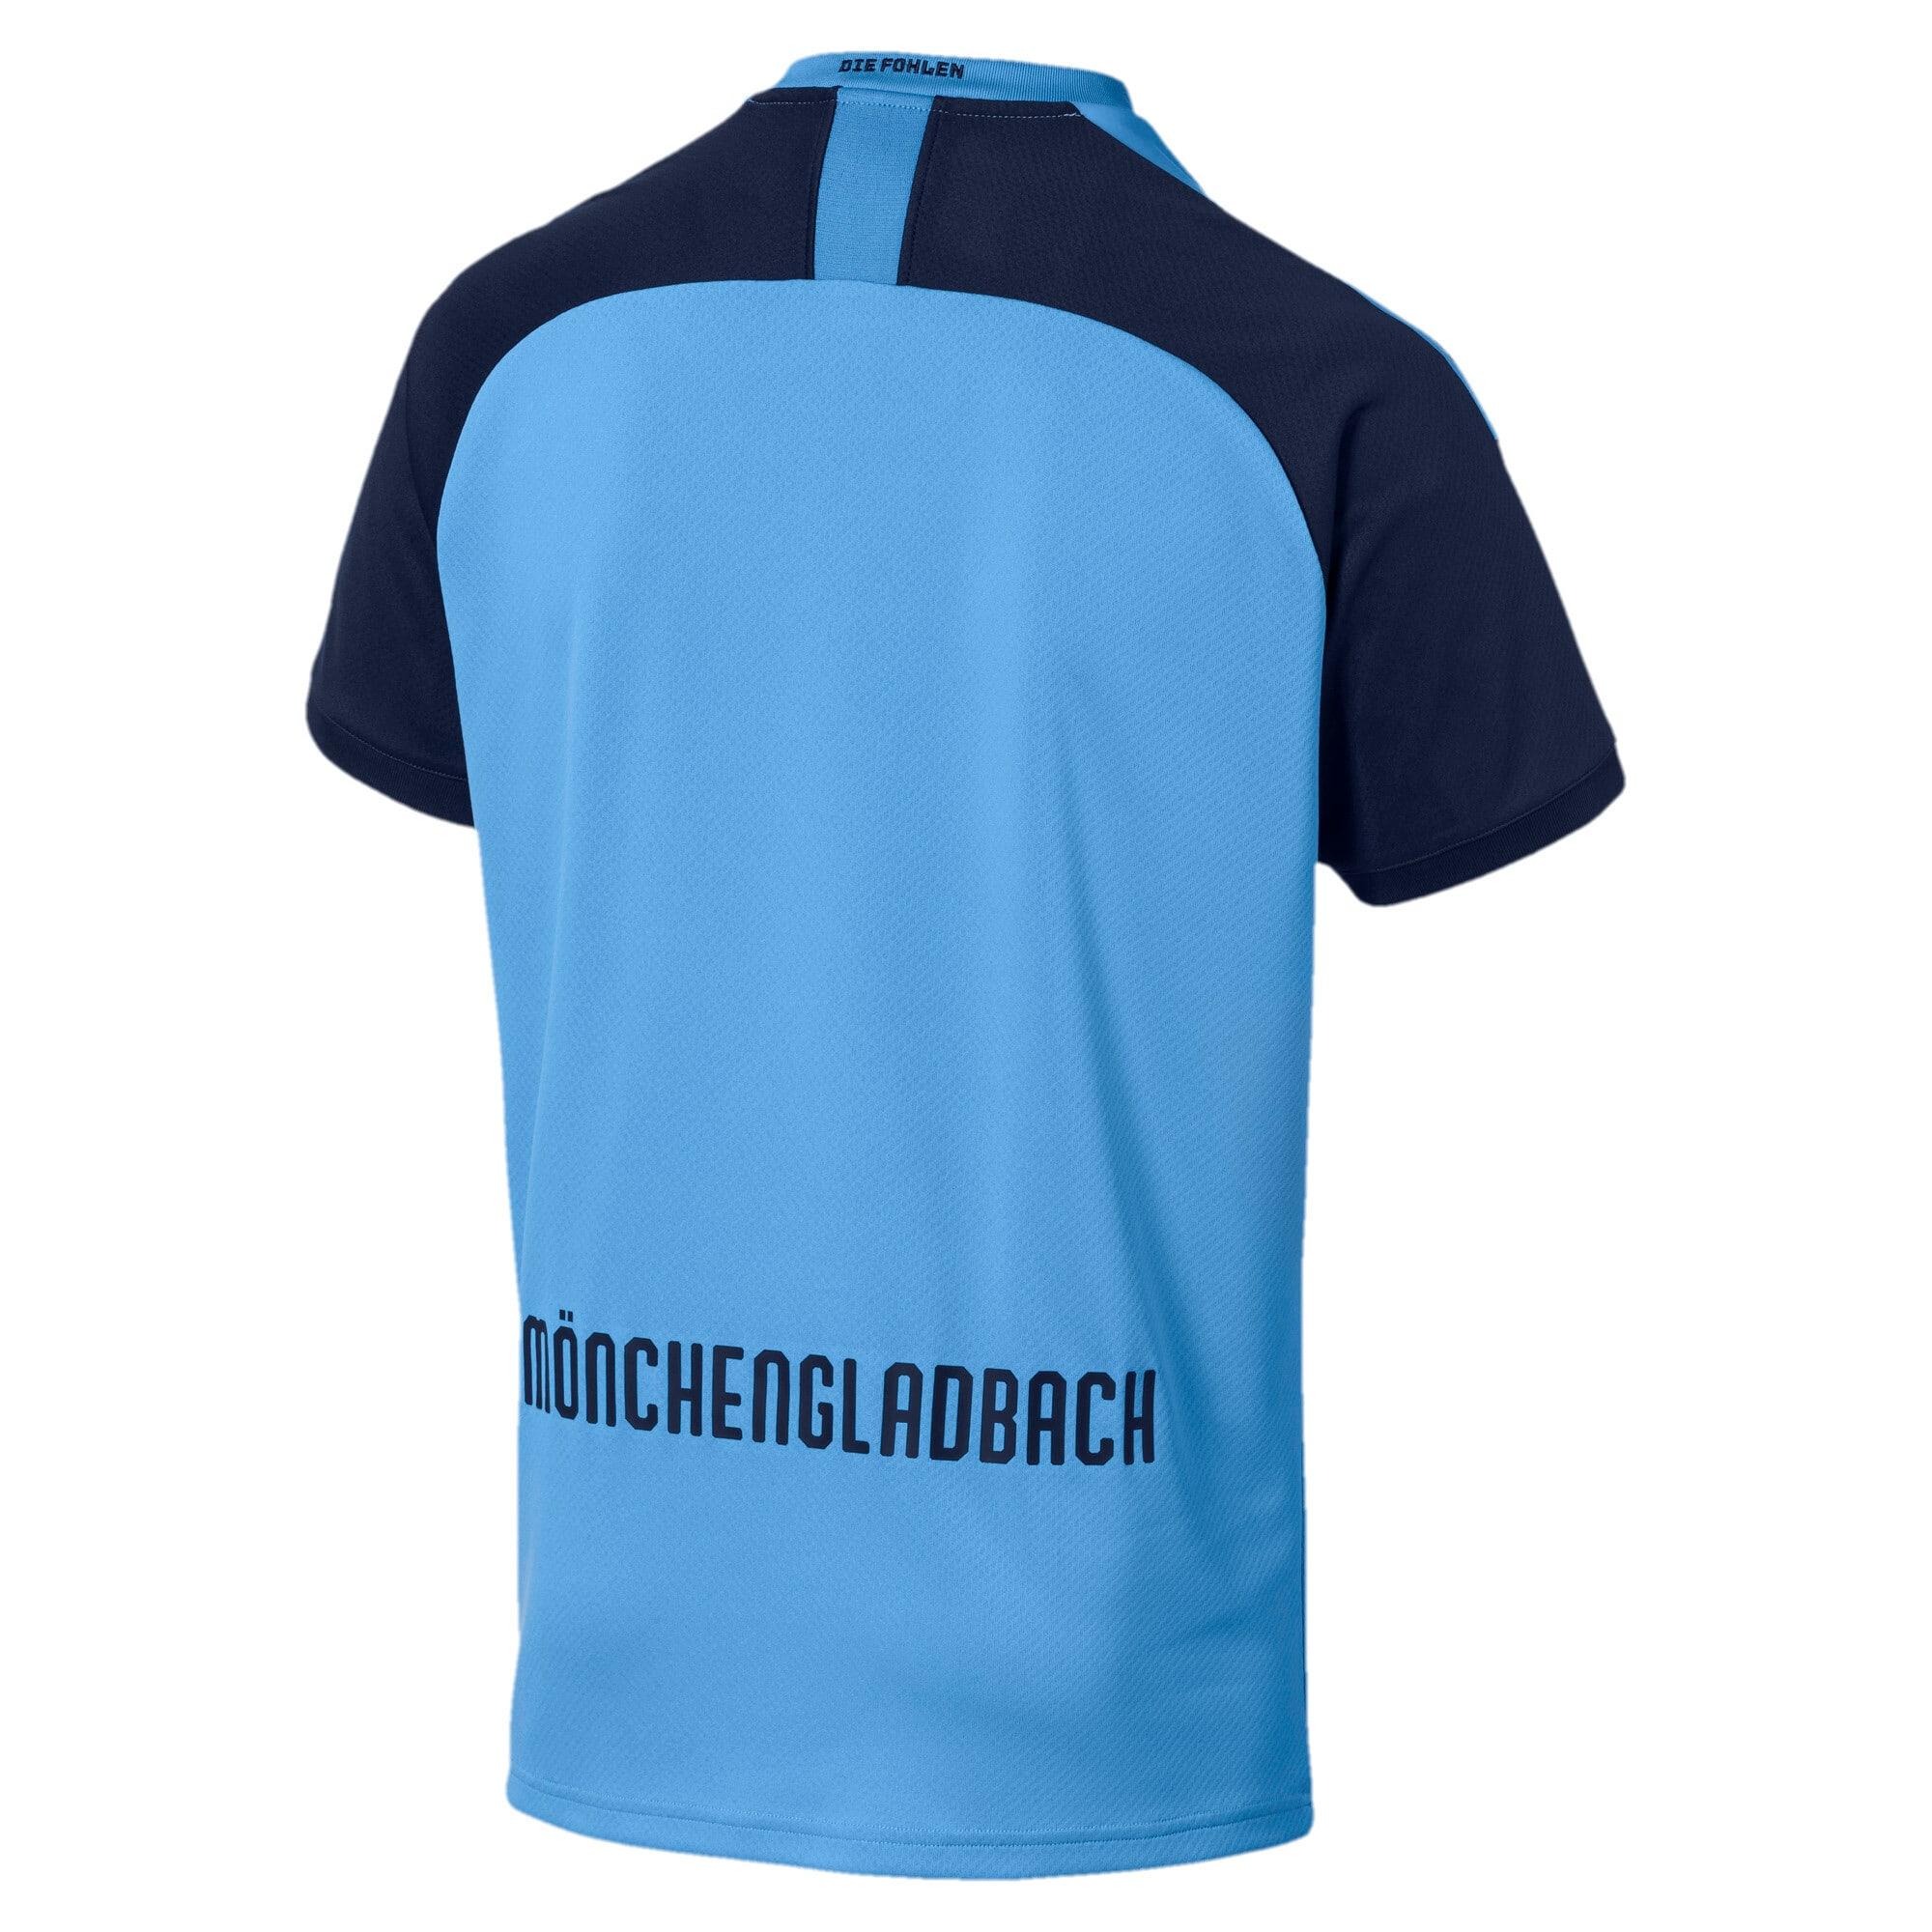 Thumbnail 2 of Borussia Mönchengladbach Men's Away Replica Jersey, Team Light Blue-Peacoat, medium